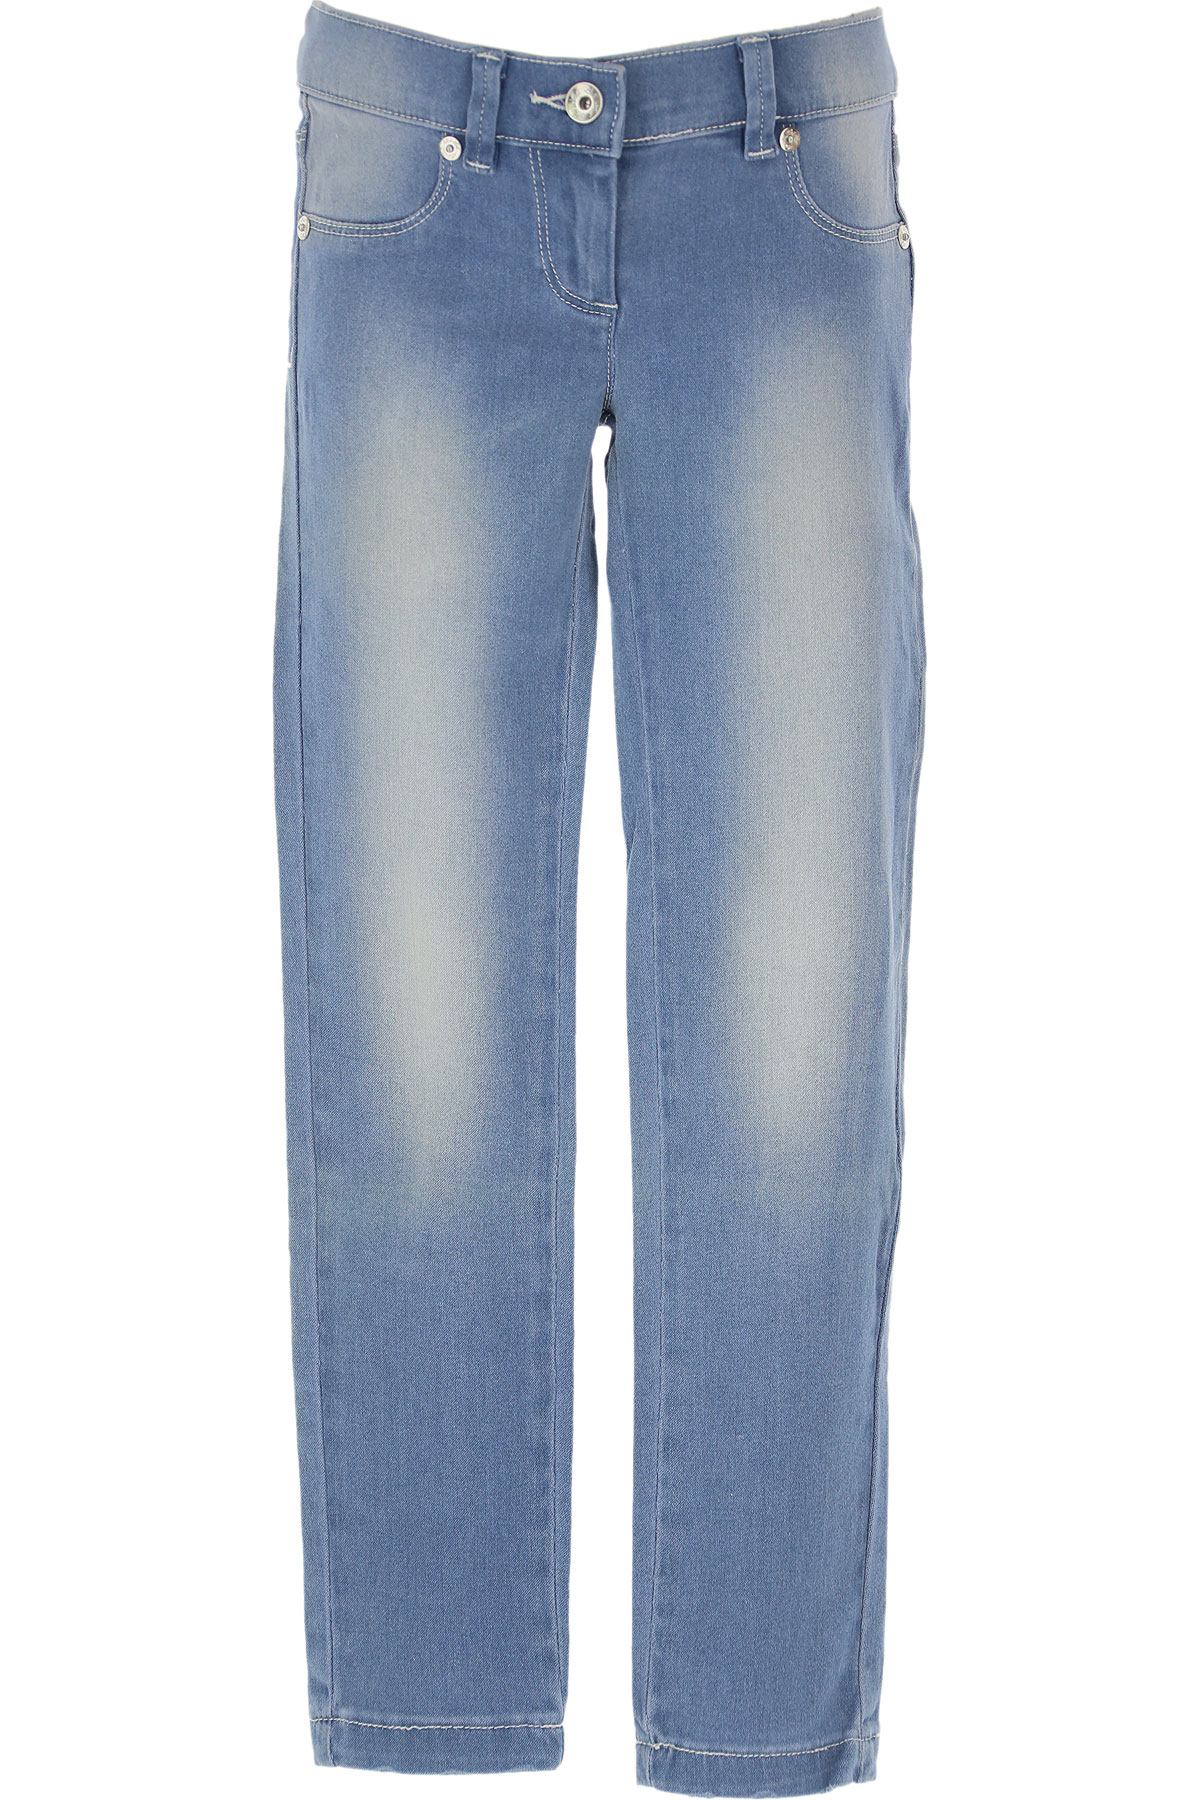 Lu - Lu Kids Jeans for Girls On Sale in Outlet, Denim Light Blue, Cotton, 2019, M S XXL